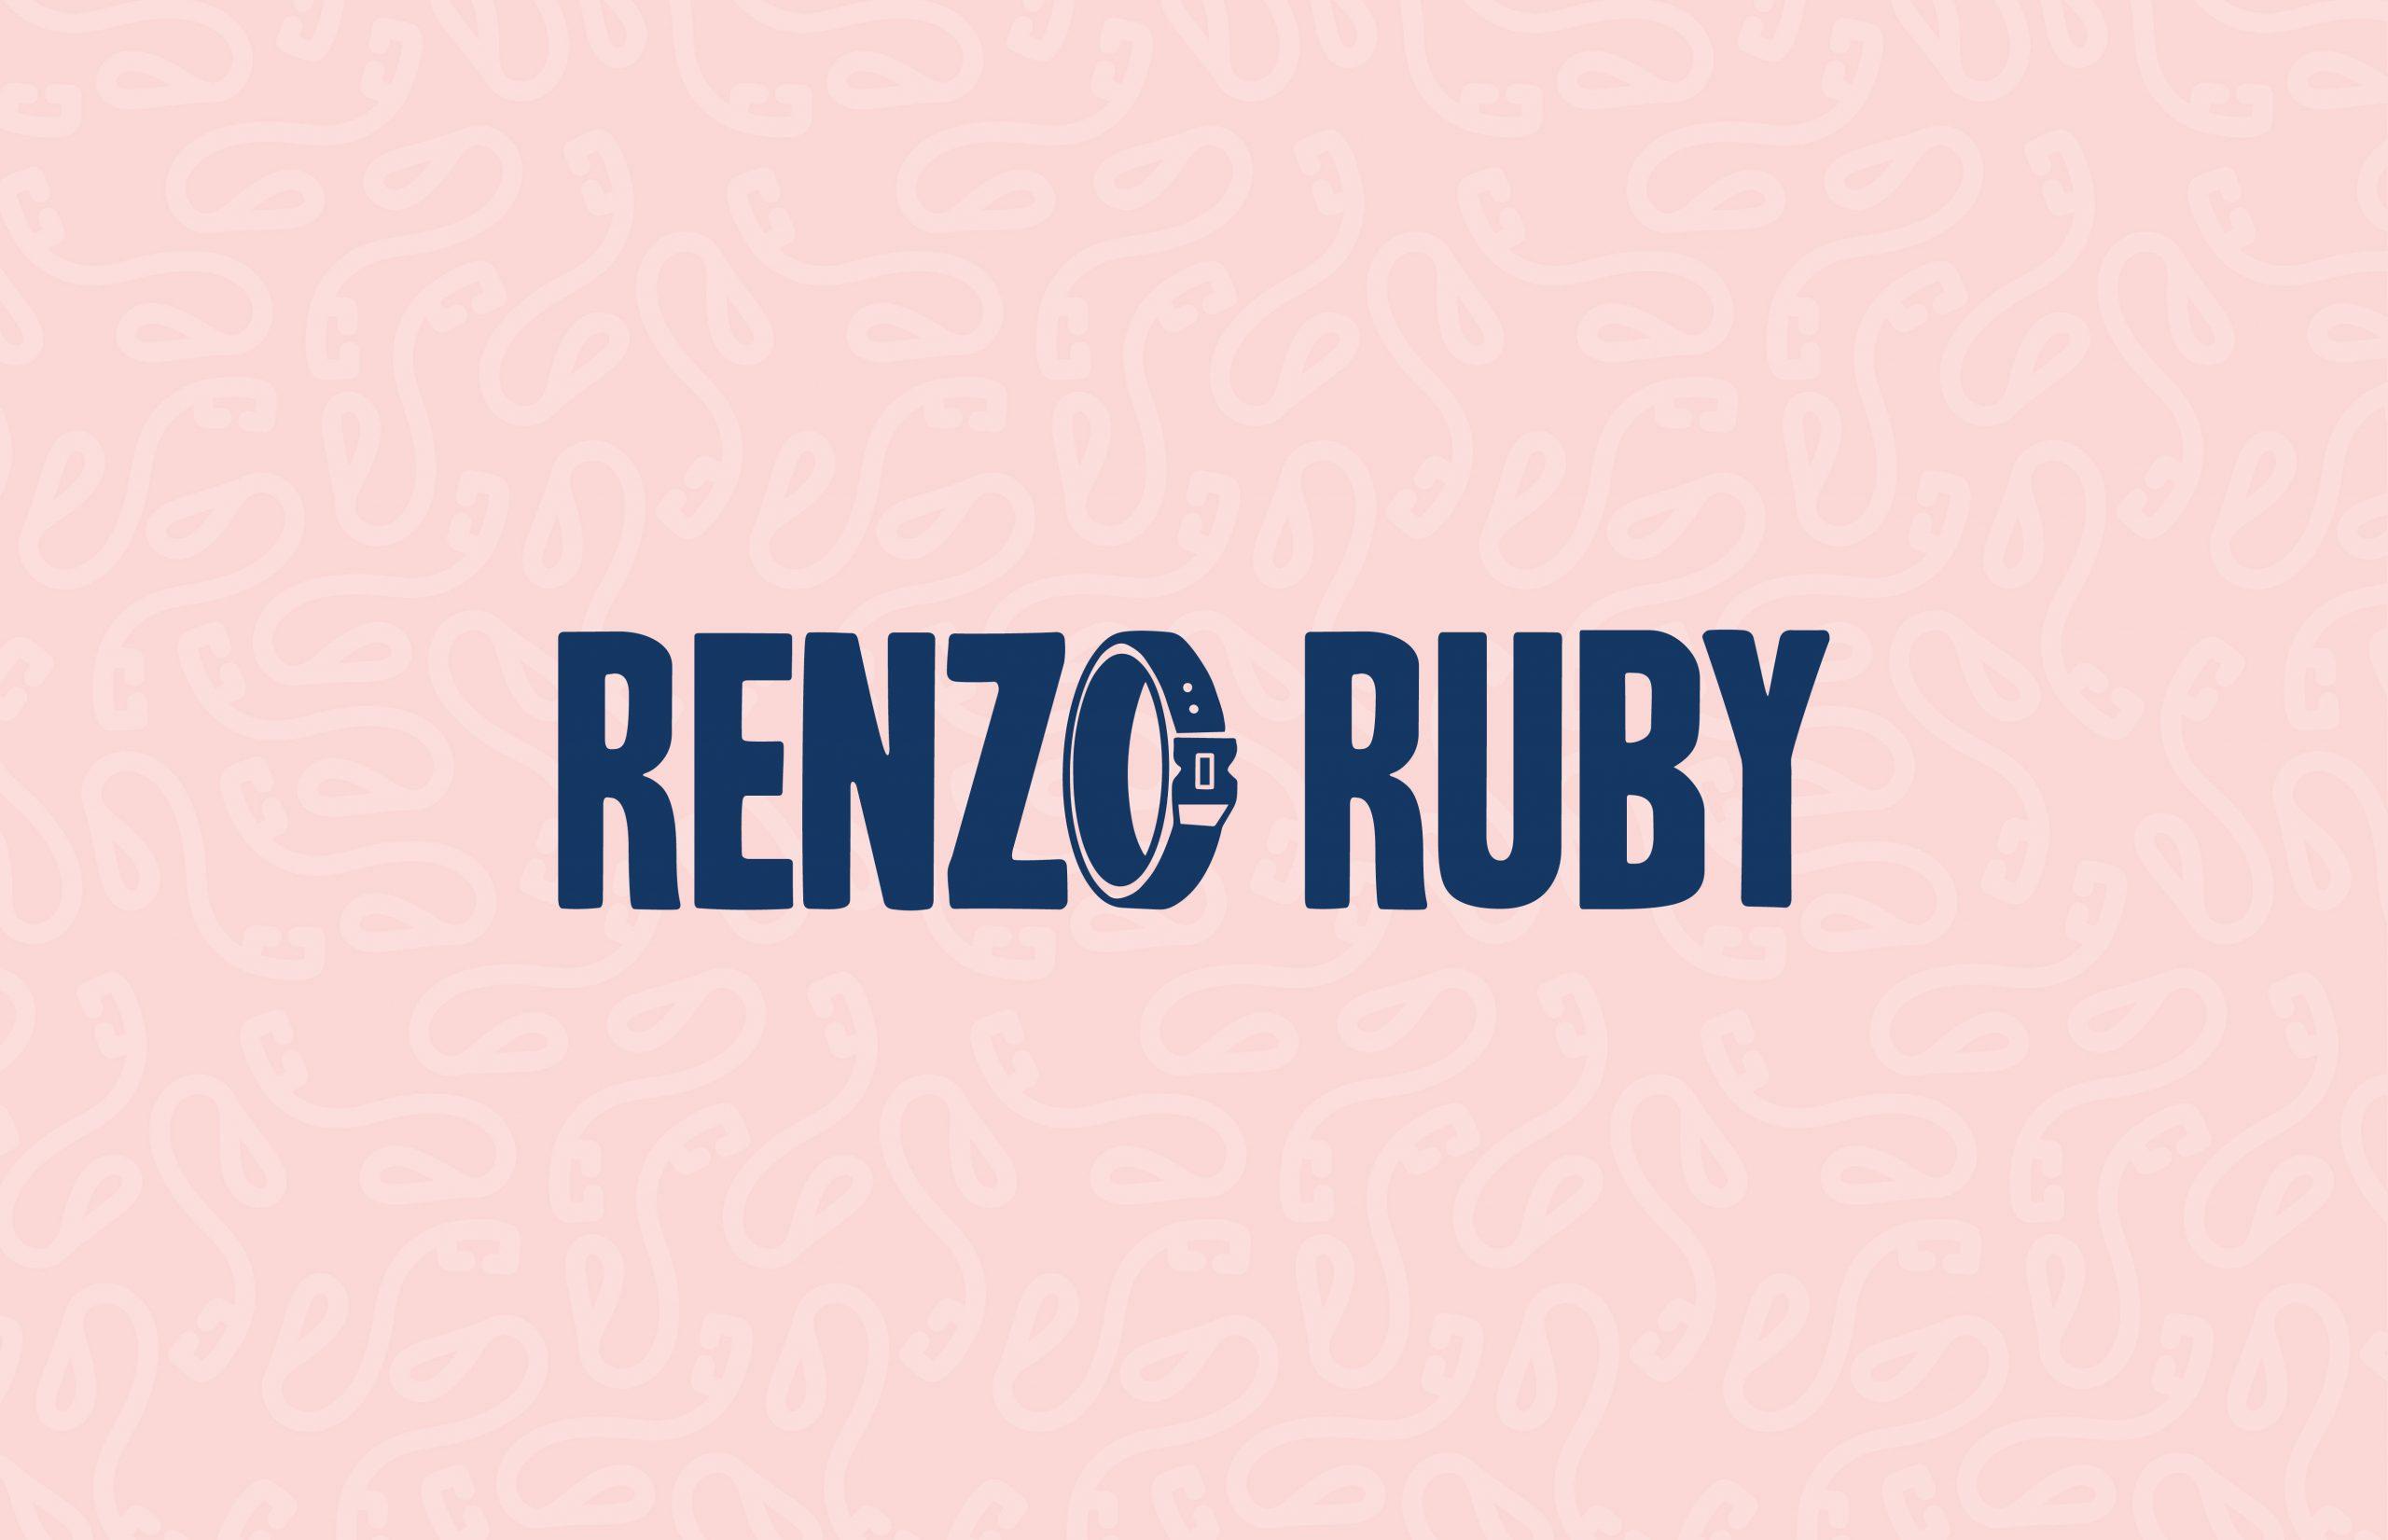 Renzo Ruby logo